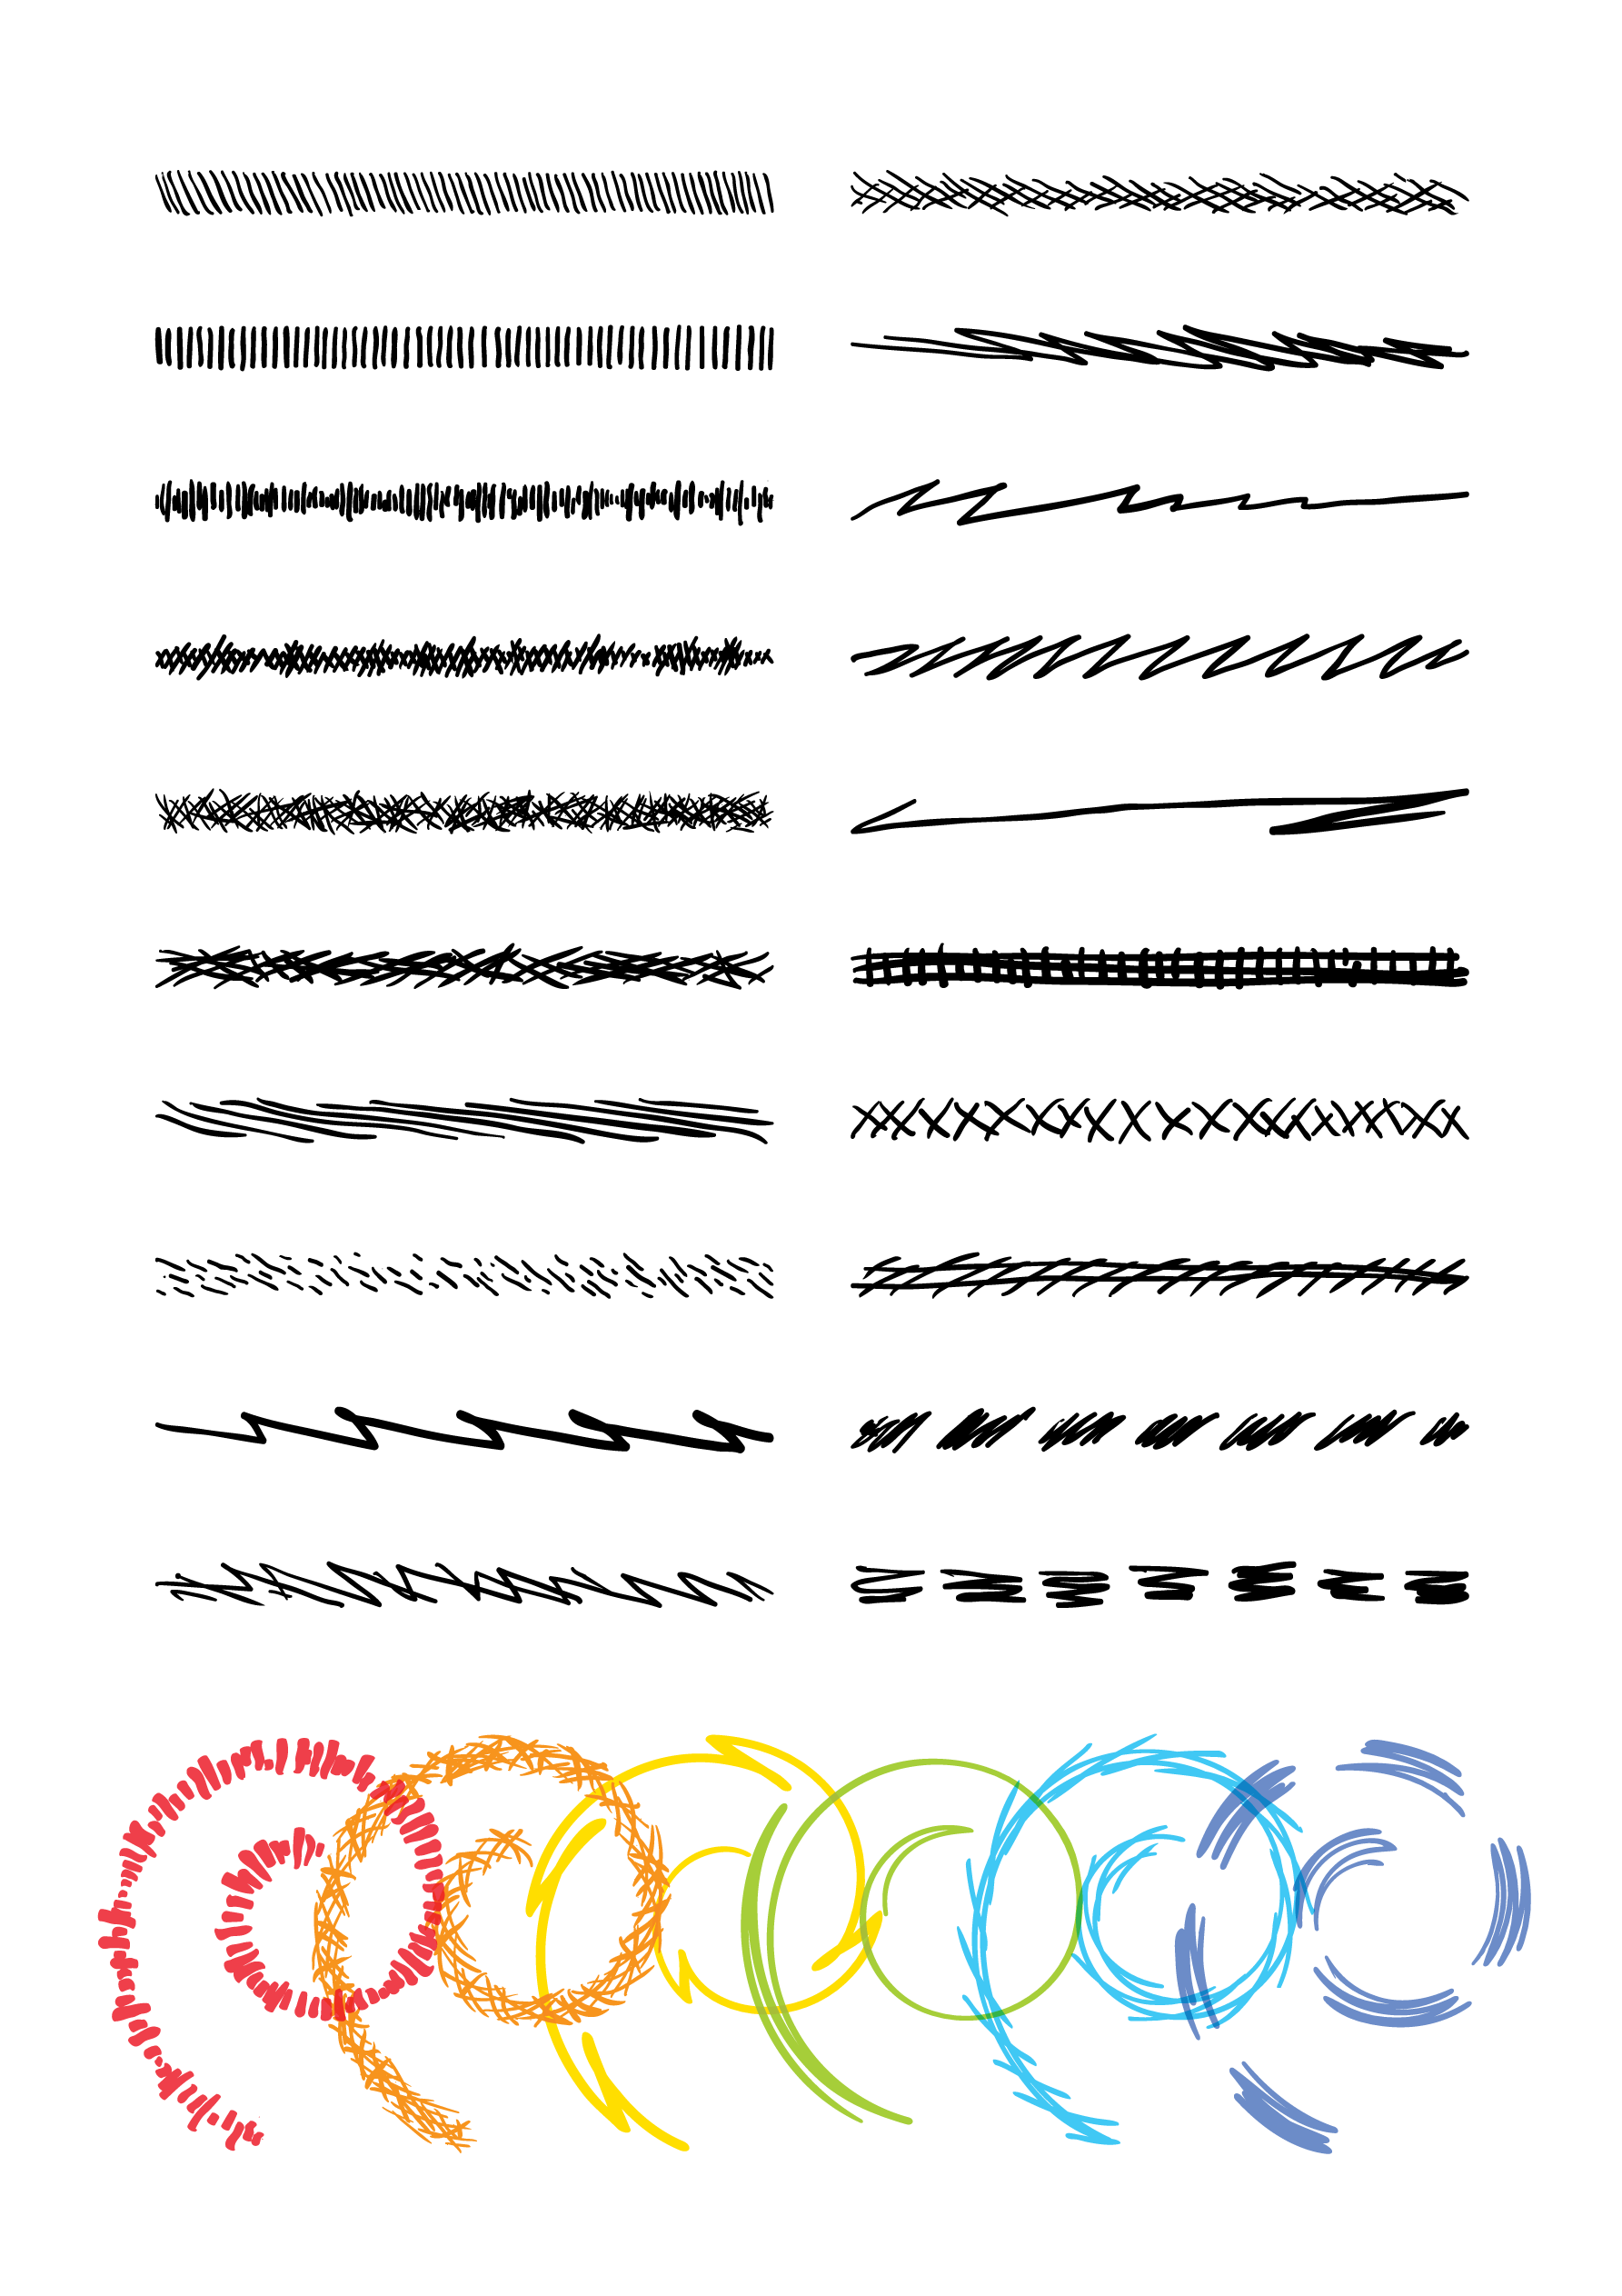 100 Adobe Illustrator Pinsel Fur Skizzenartige Strichzeichnungen Strichzeichnung Illustrator Vektorgrafik